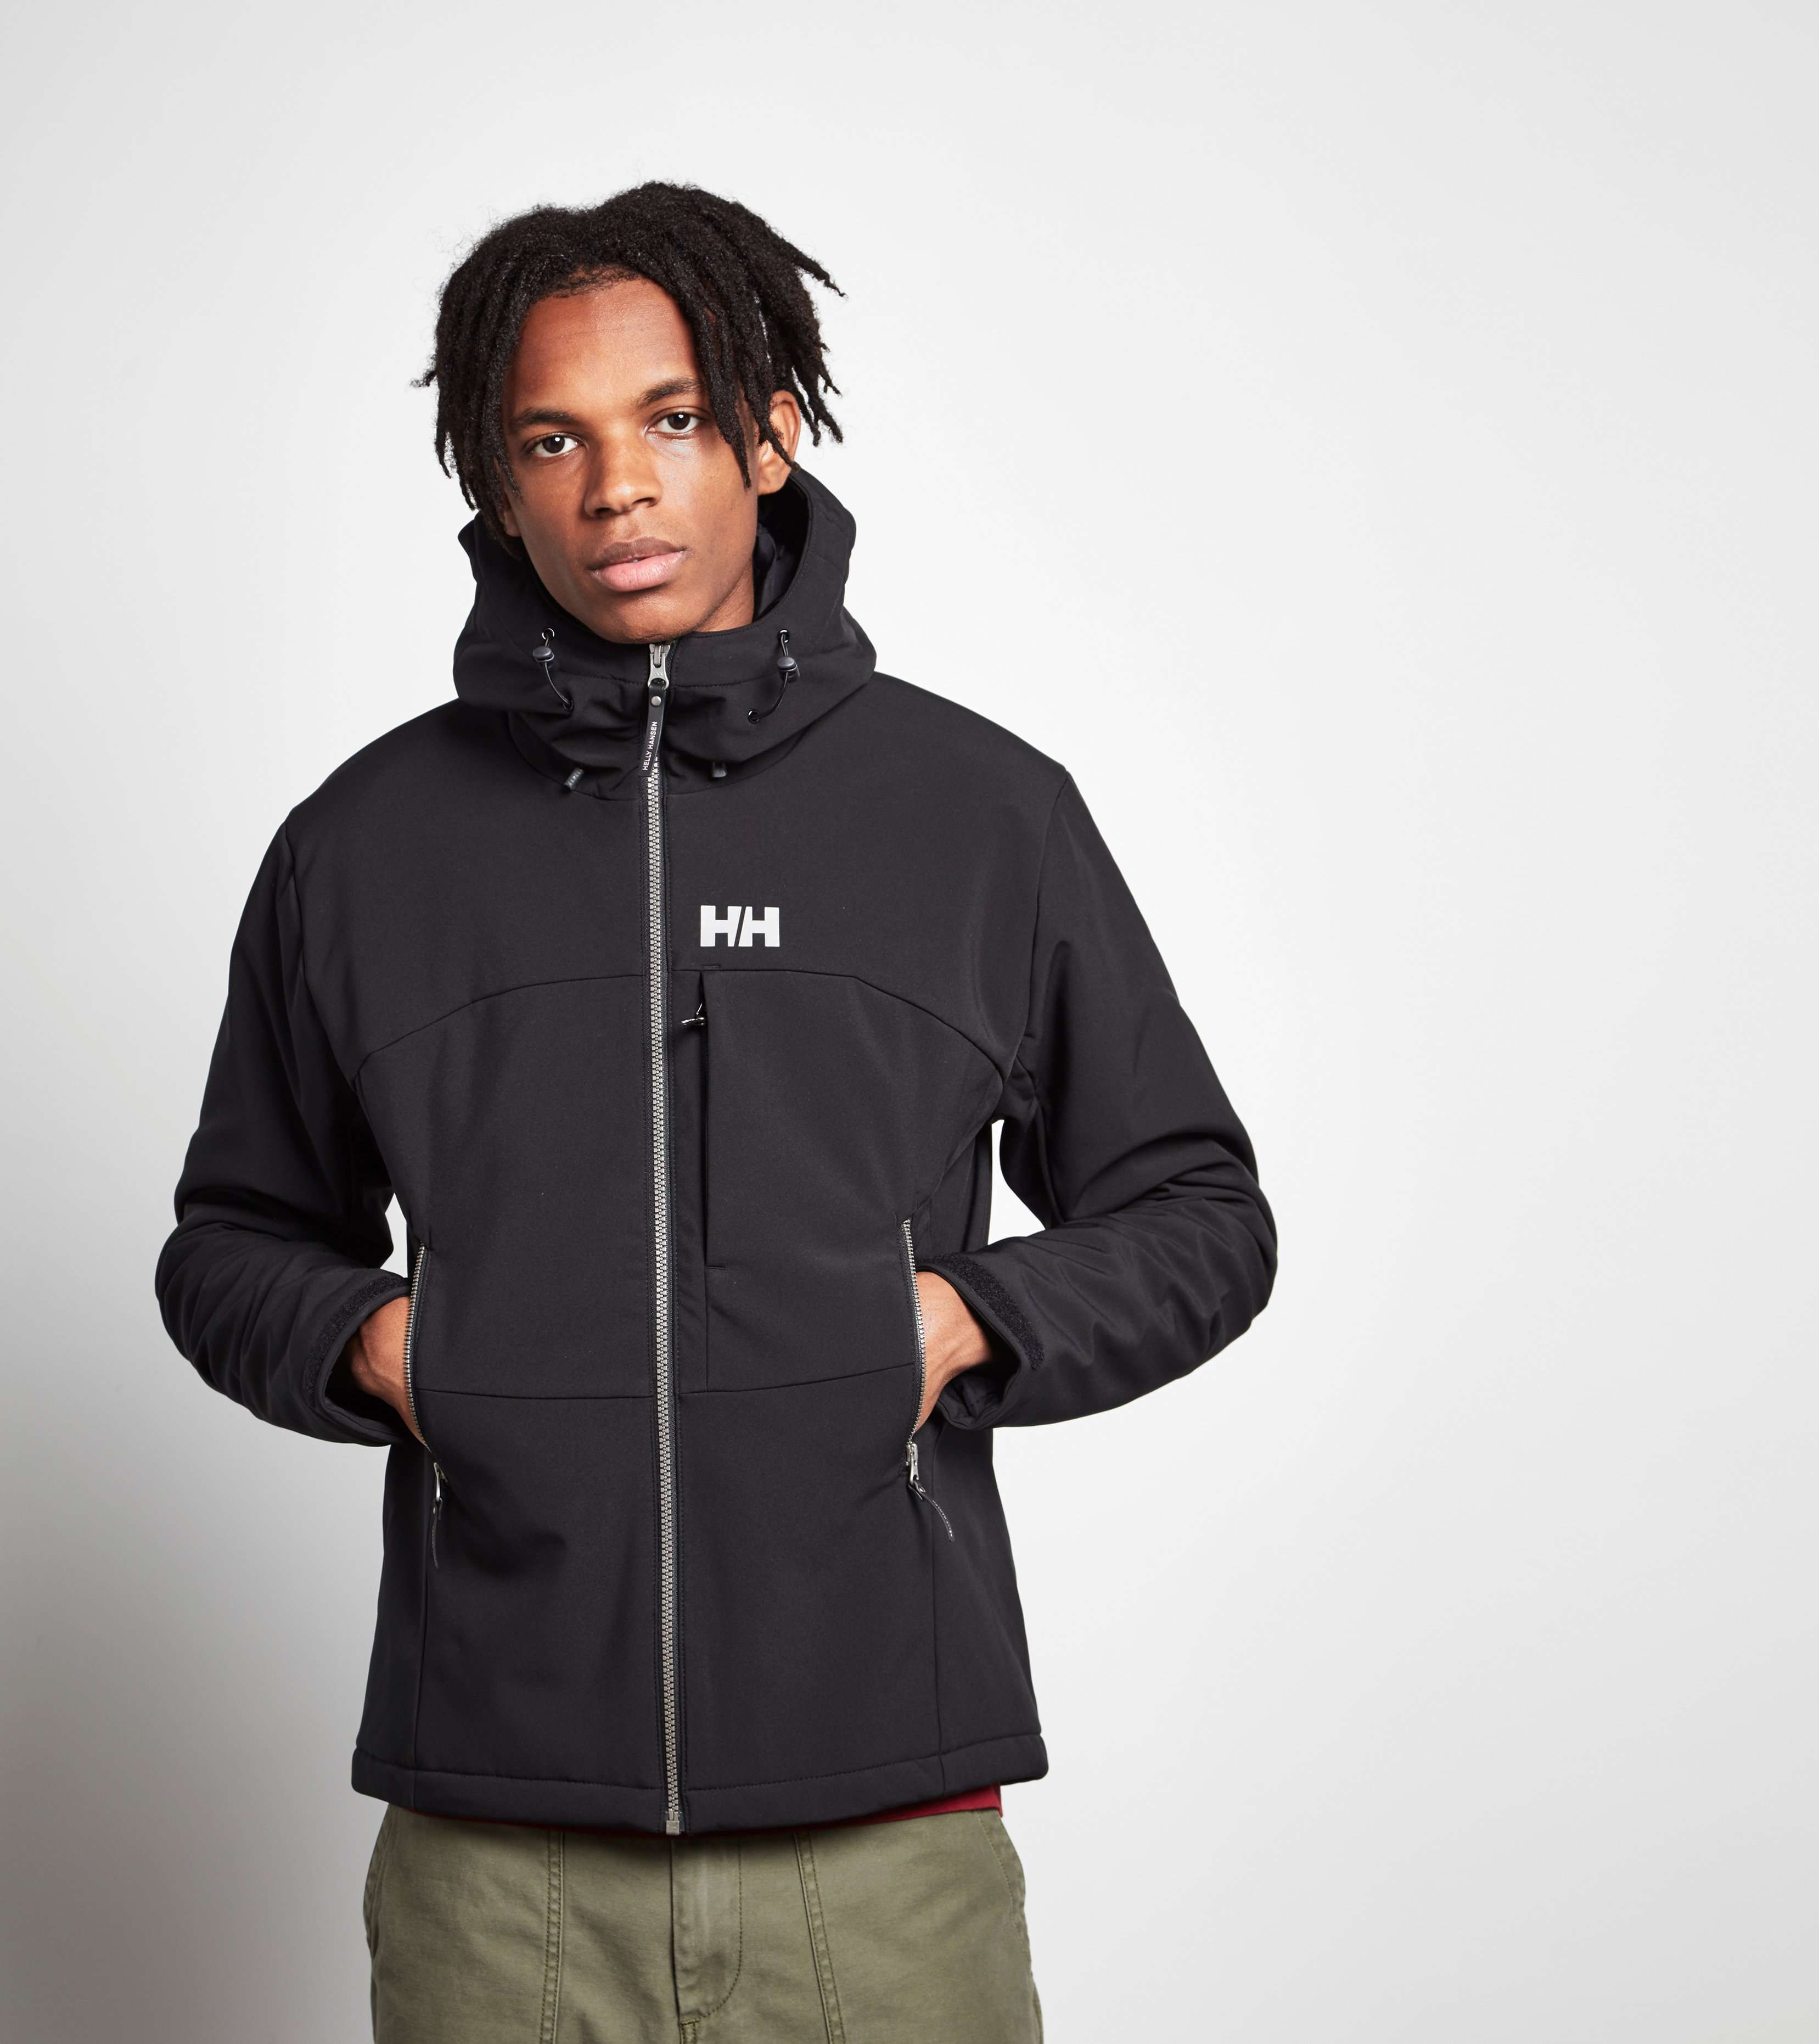 Helly Hansen Paramount Insulated Softshell Jacket | Size